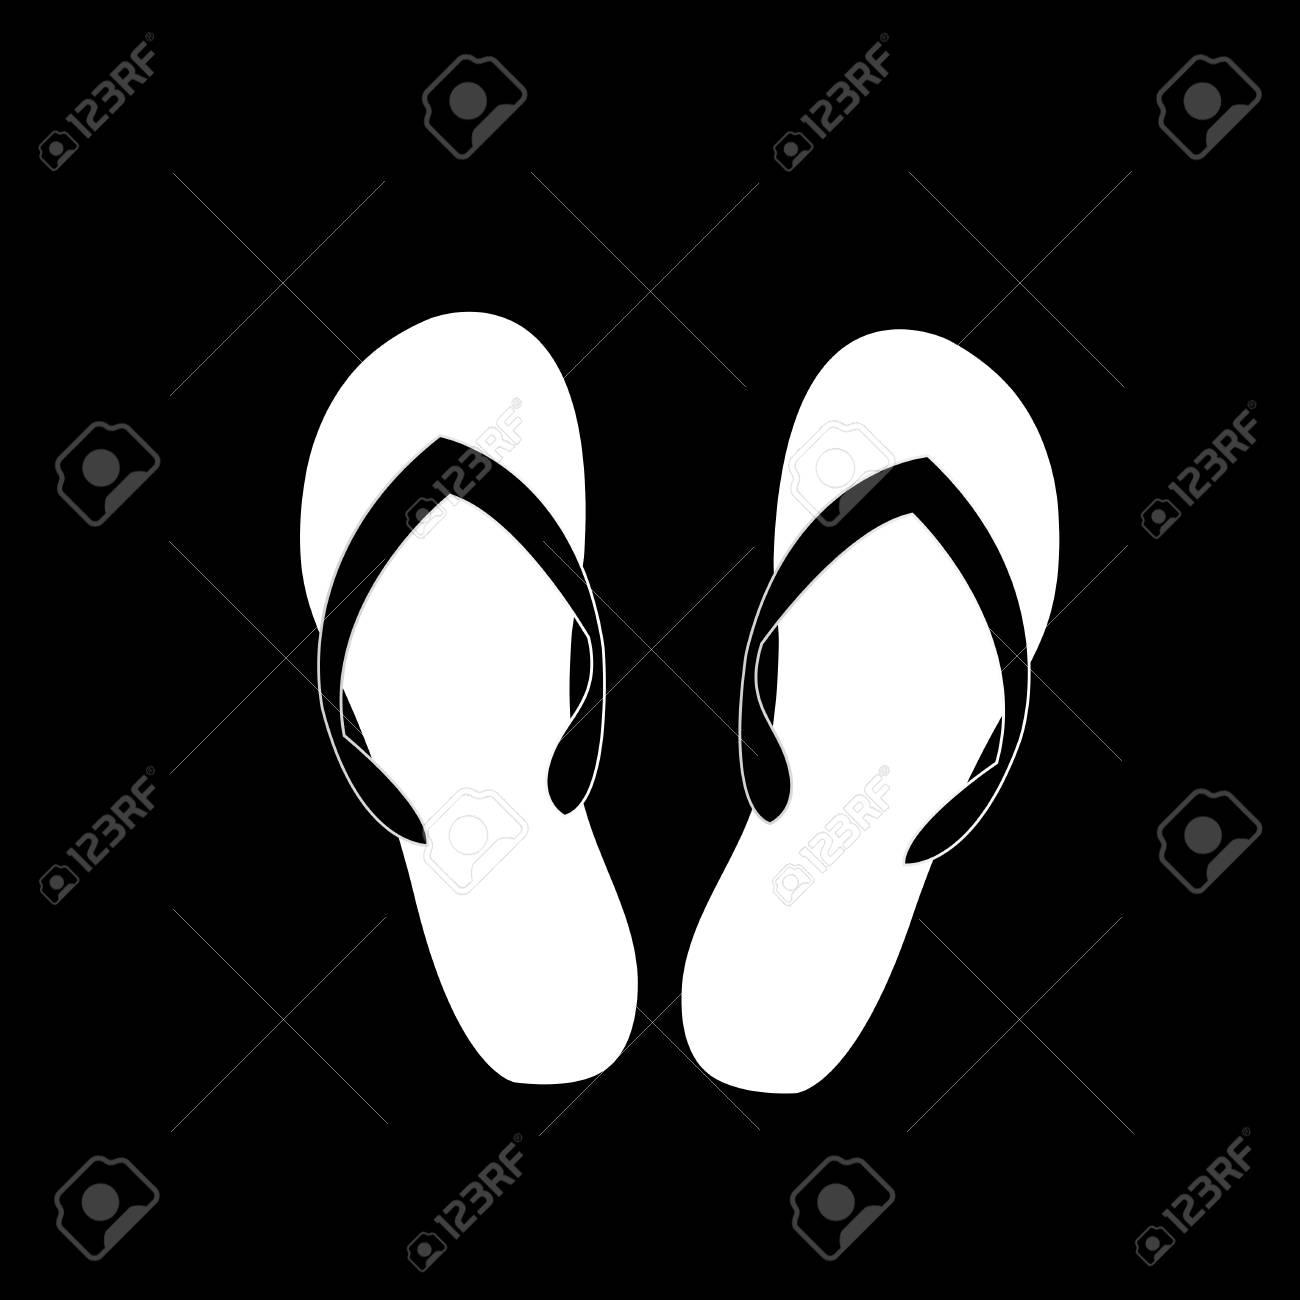 Vector Black And White Monochrome Silhouette Illustration Of